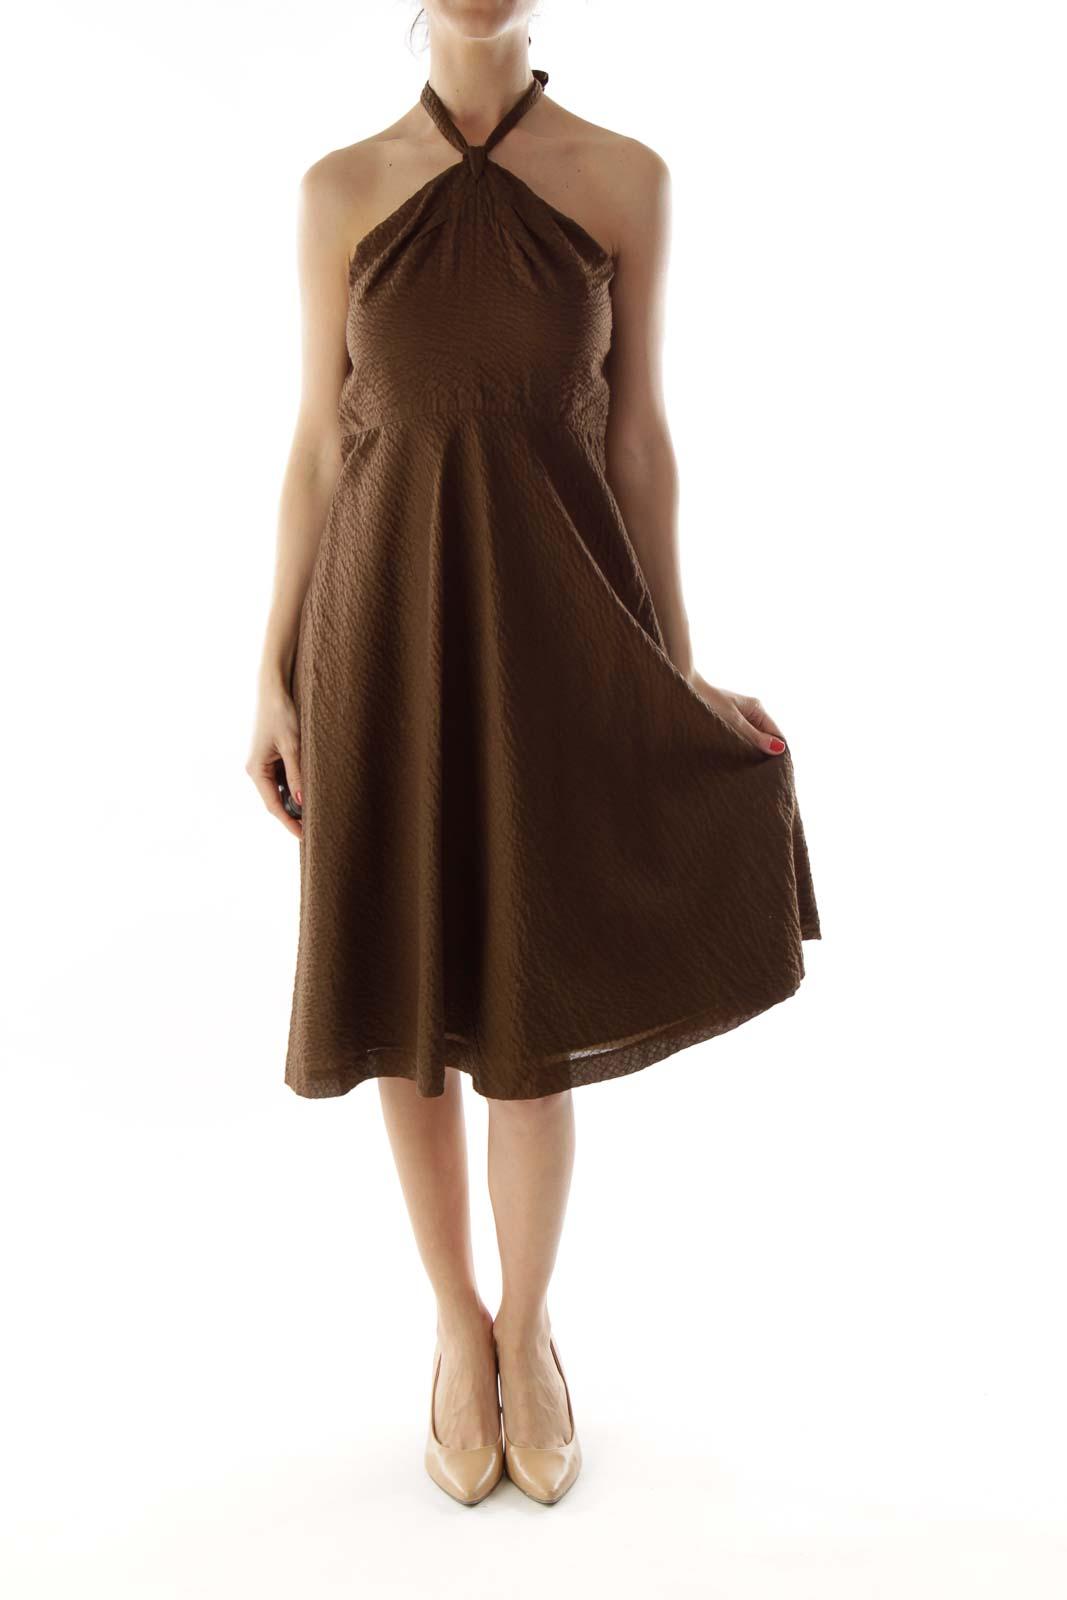 Brown Textured Halter Dress